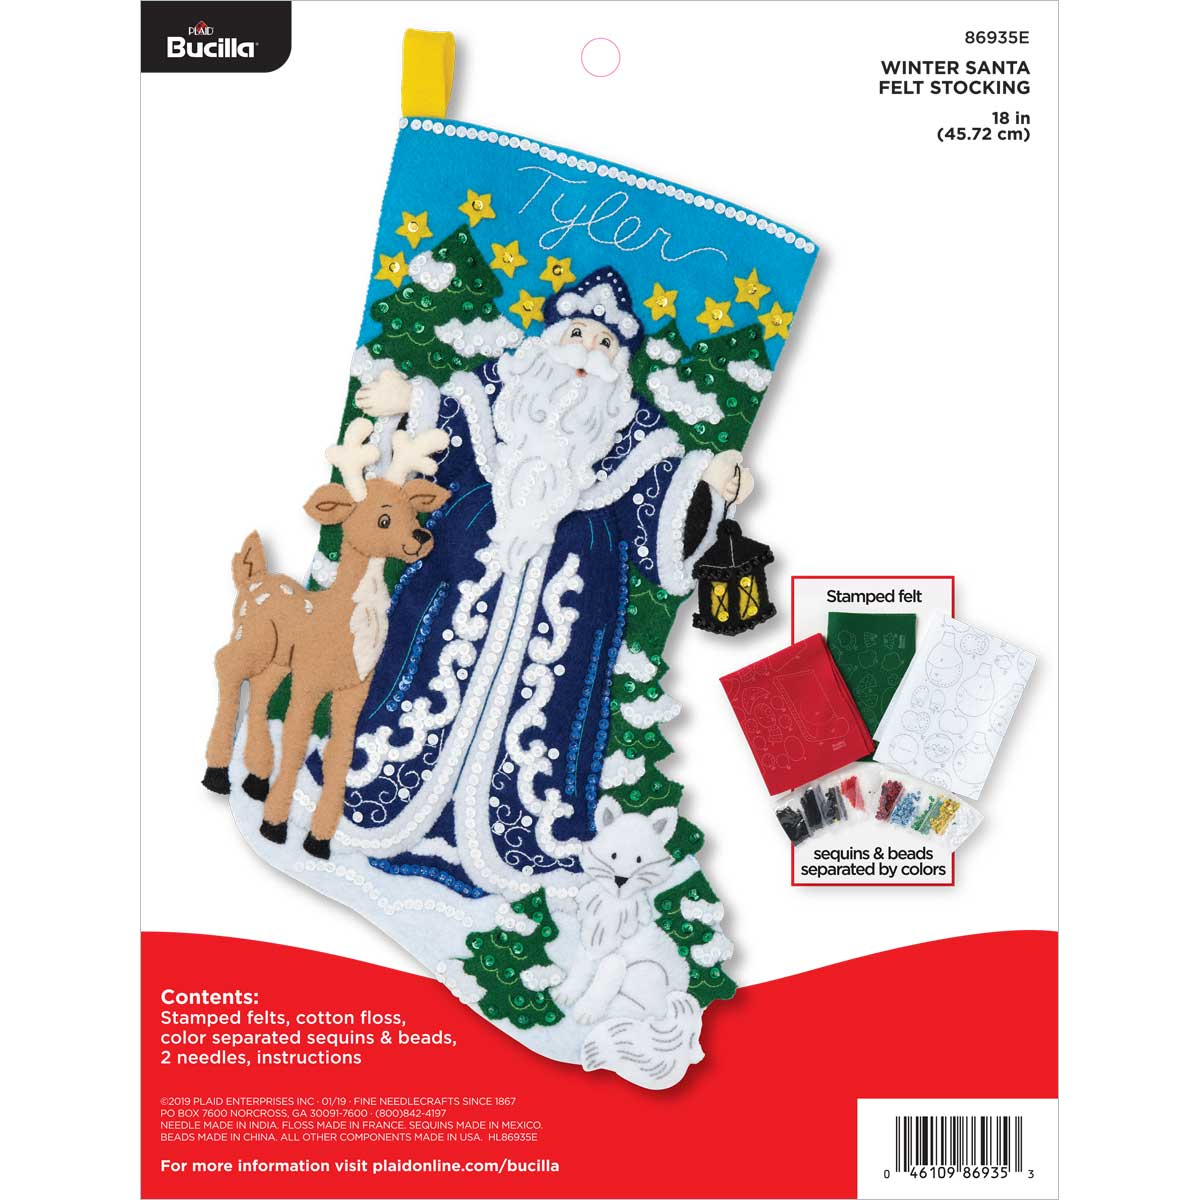 Bucilla ® Seasonal - Felt - Stocking Kits - Winter Santa